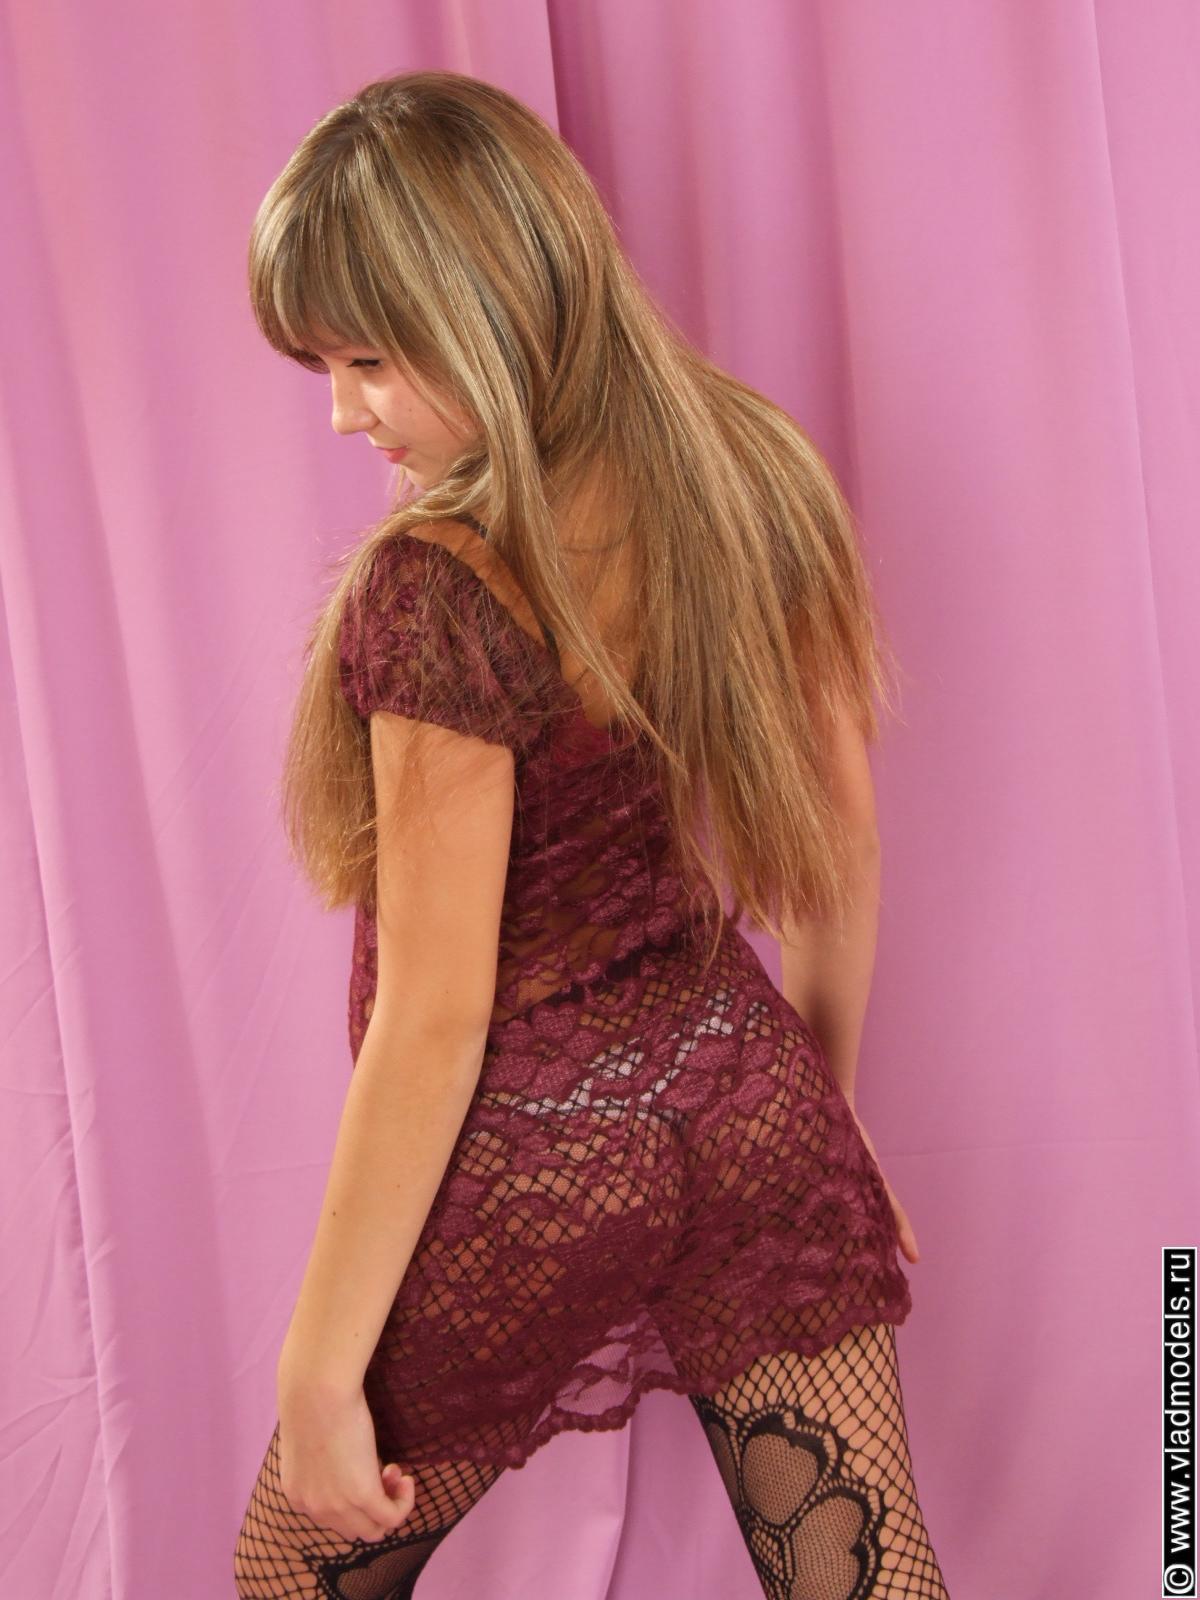 VLADMODELS IRA Y160 - SET 47 74P   Free hot girl pics